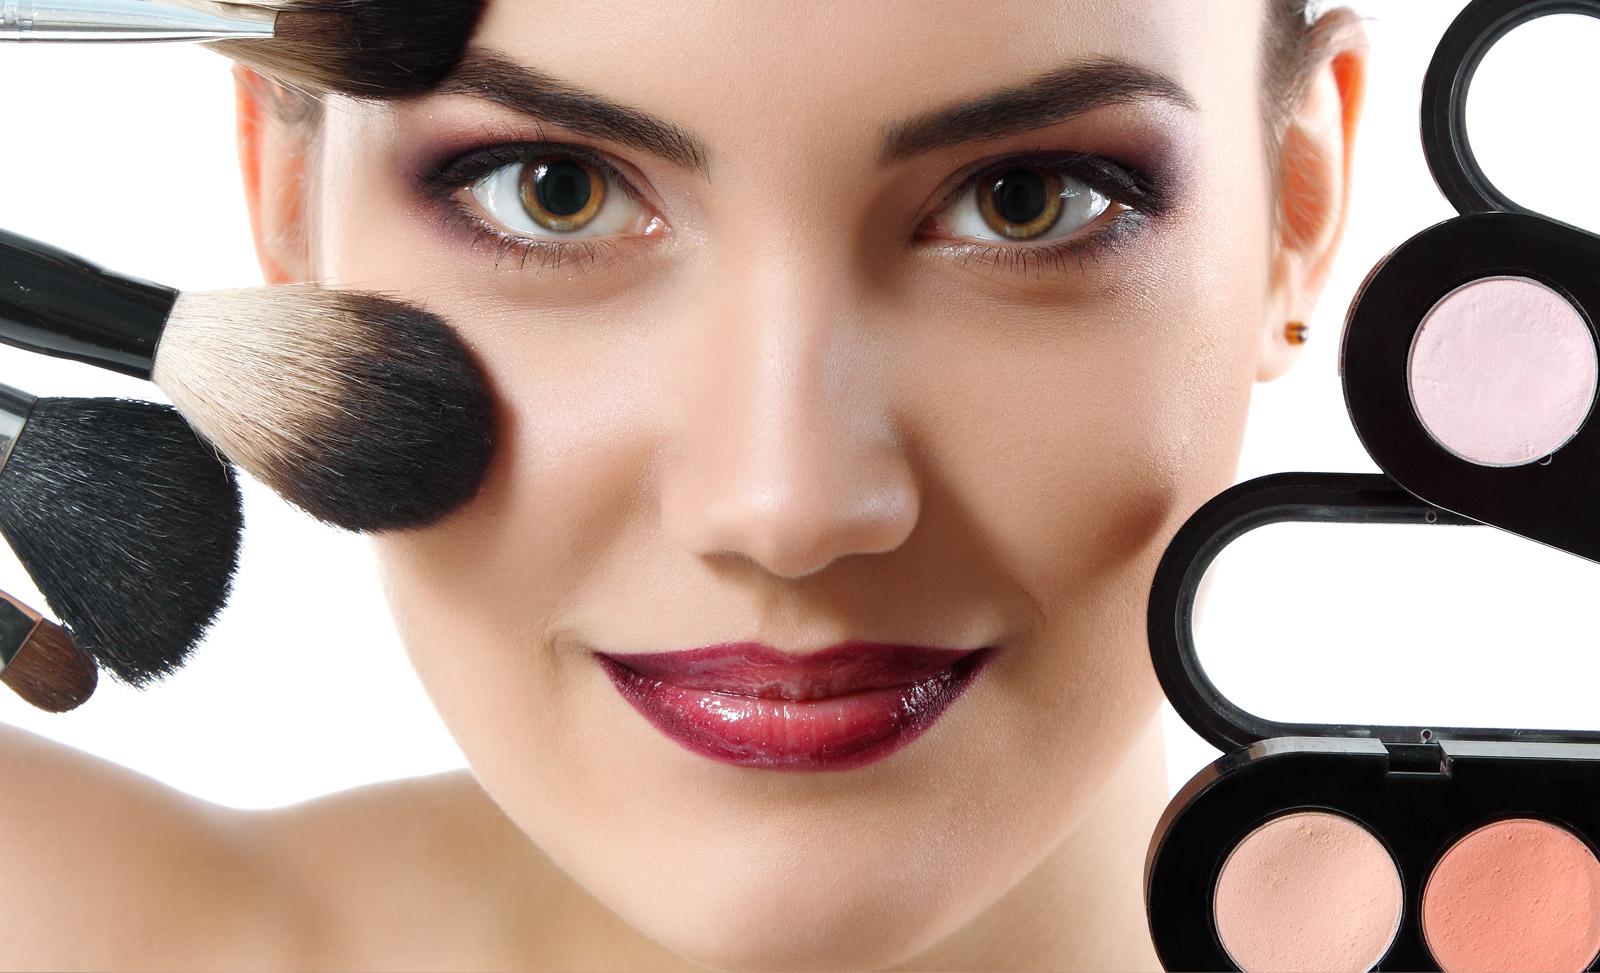 Hair Salon Wedding Hair Stylist And Makeup Service Hair S Studio Radda In Chianti